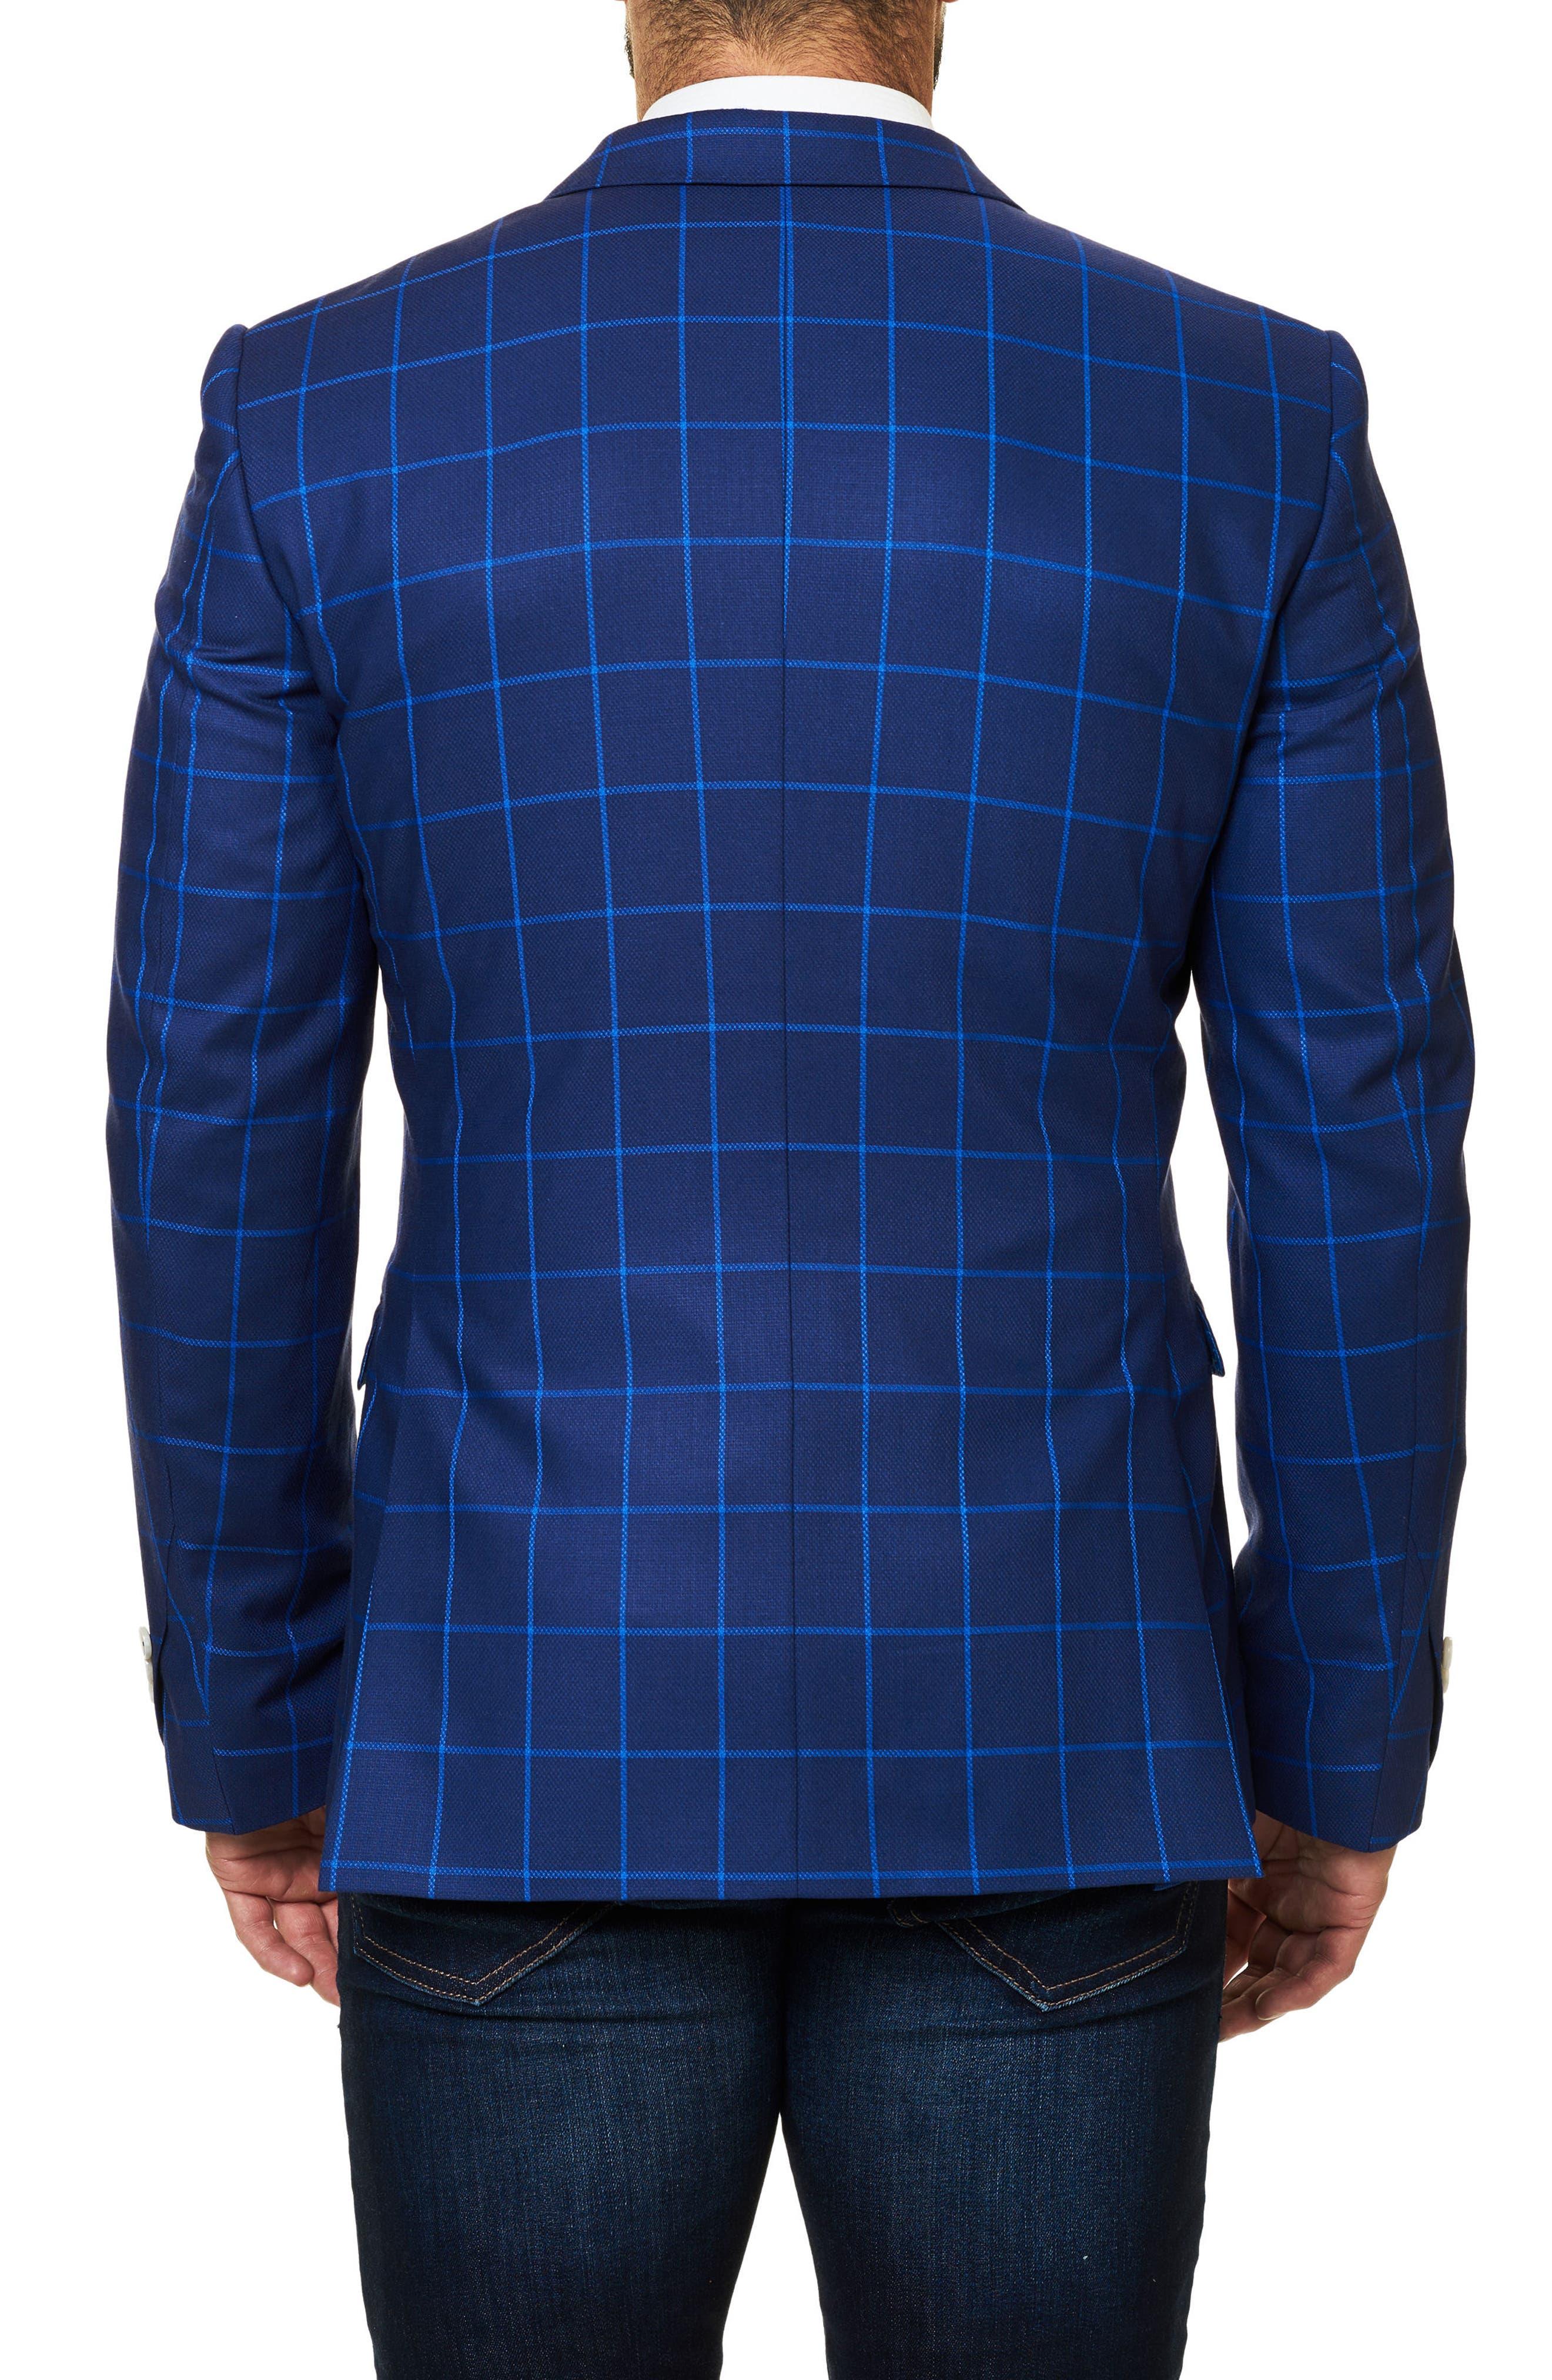 Descarte Windowpane Sport Coat,                             Alternate thumbnail 2, color,                             Medium Blue